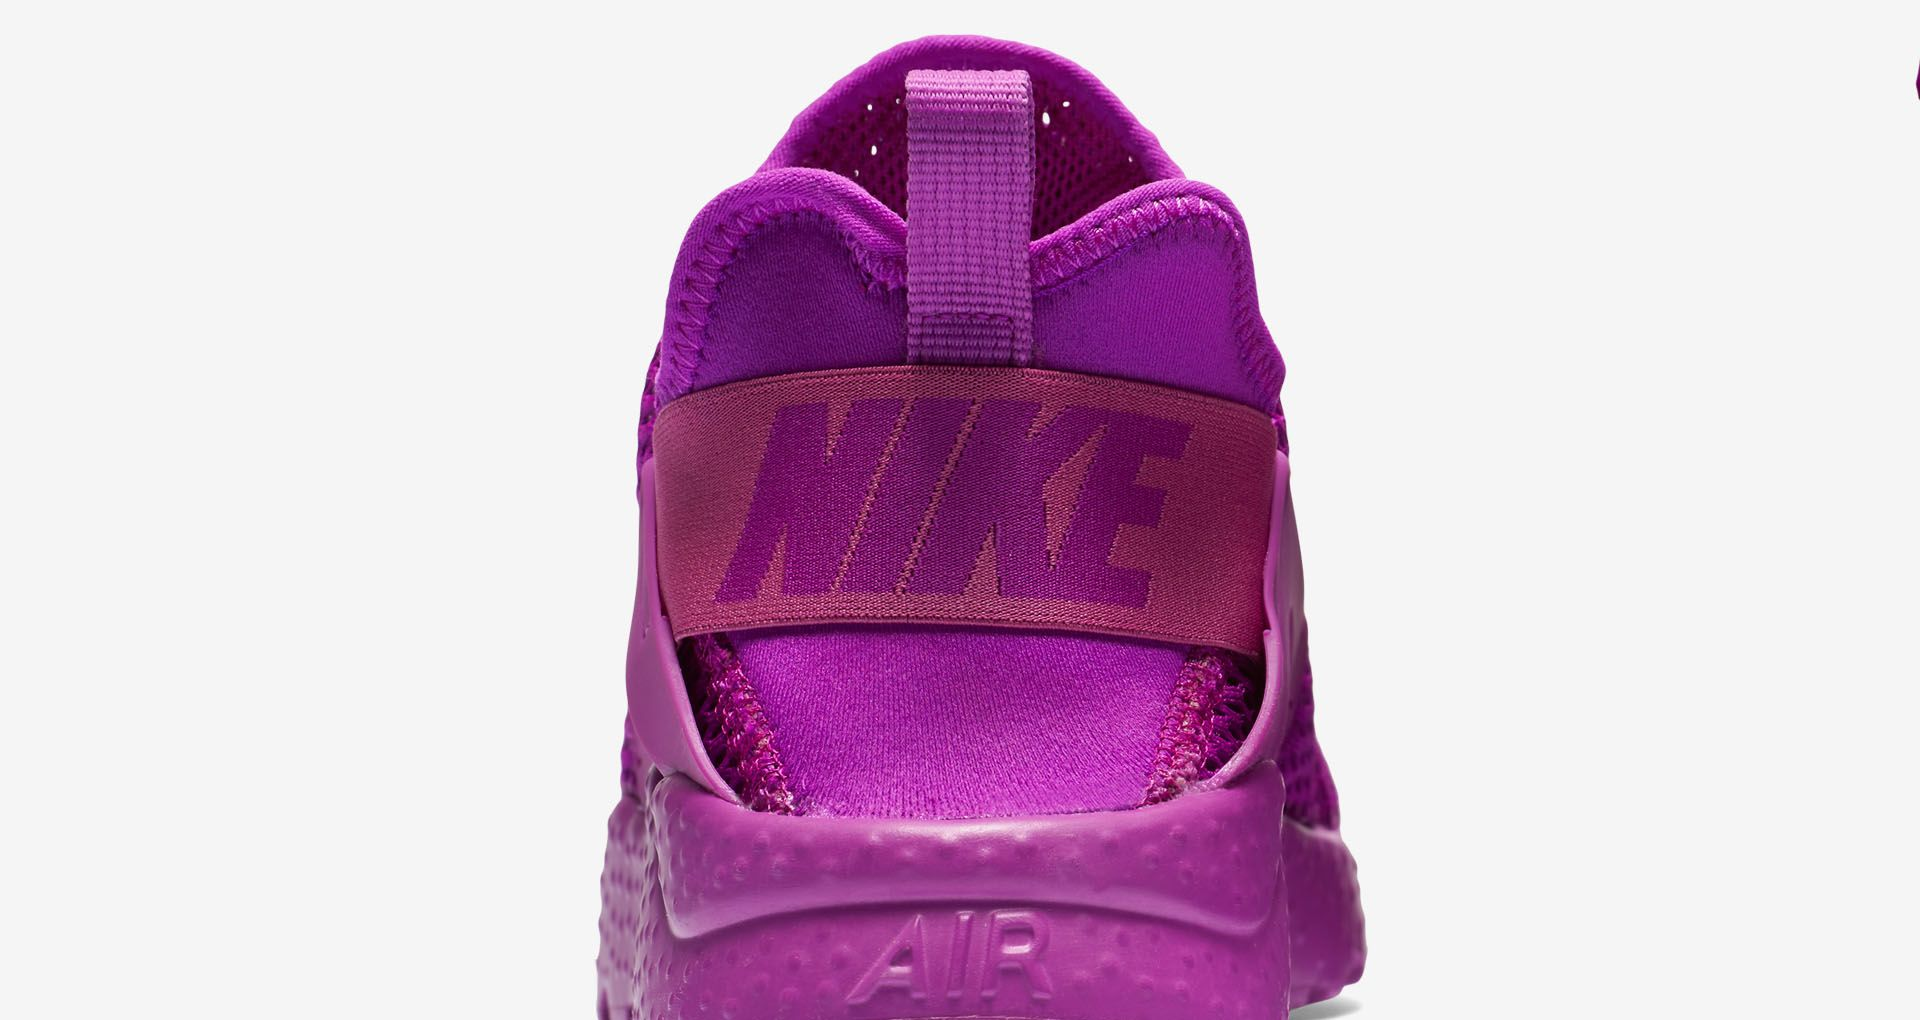 742b4fb485379 Women s Nike Air Huarache Ultra Breathe  Hyper Violet Heritage ...